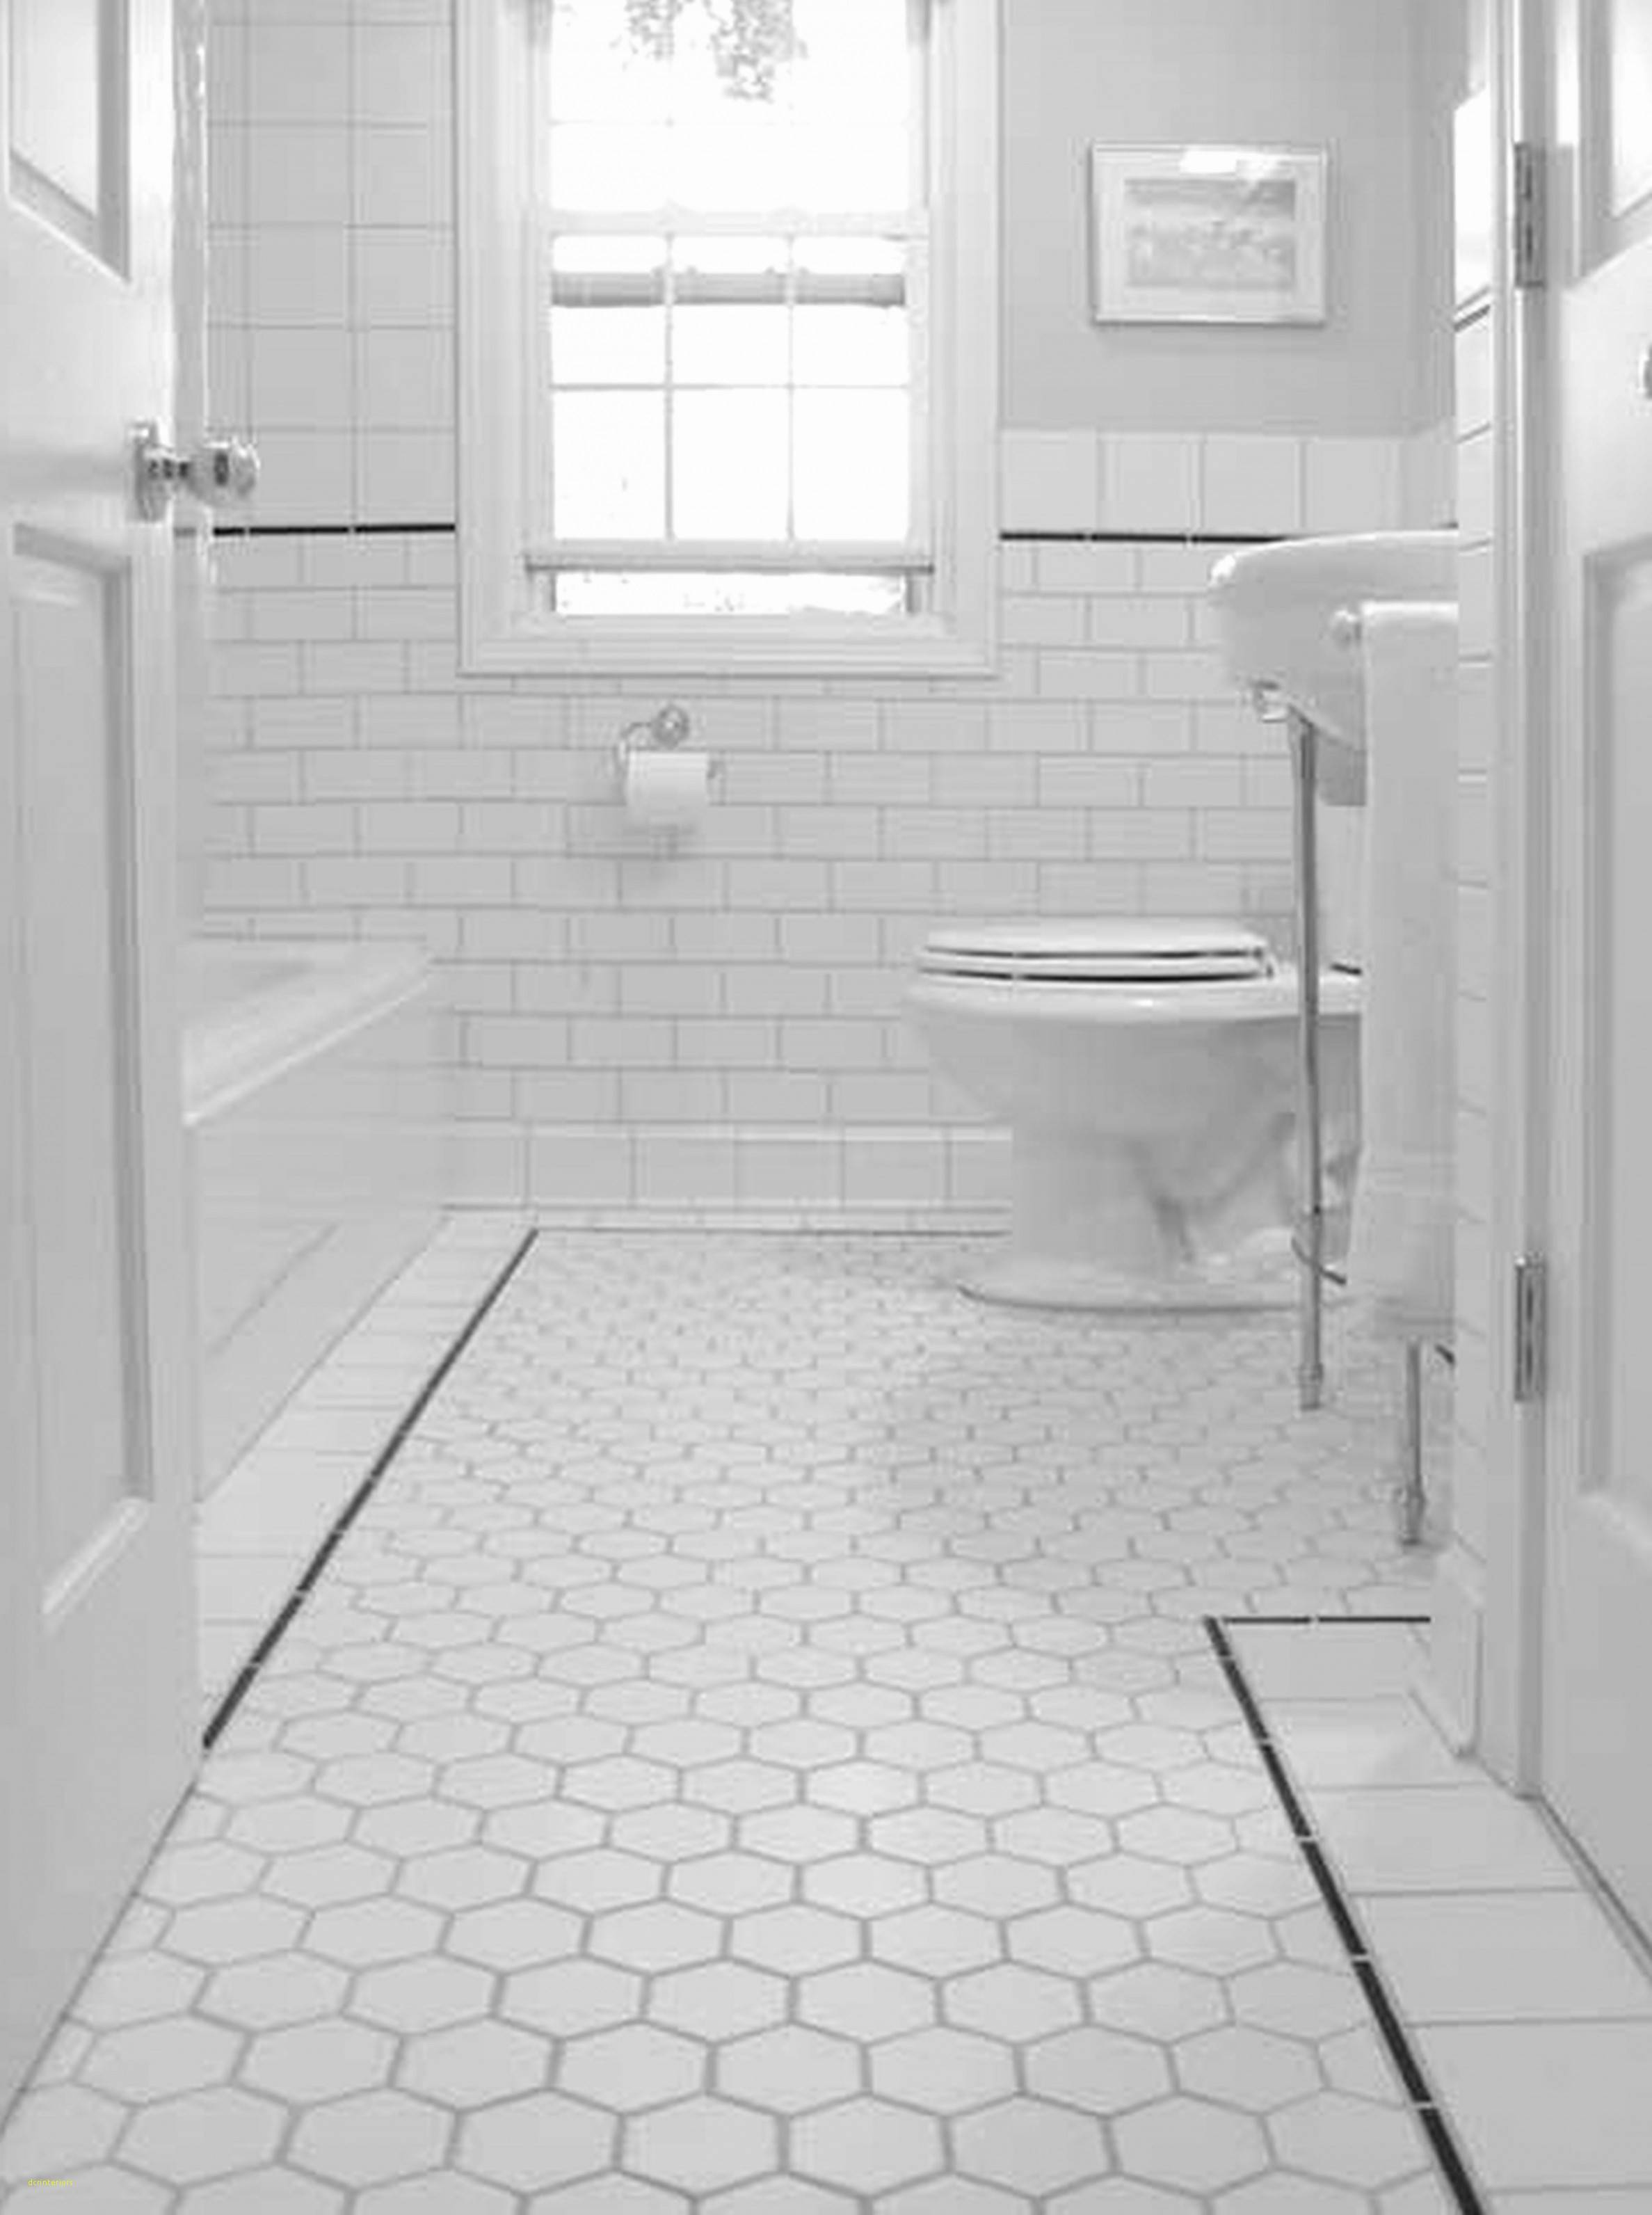 1 3 4 hardwood floors of 39 new laying floor tiles photo inside laying bathroom floor tiles new stunning inspirational installing faucet h sink new bathroom i 0d decor